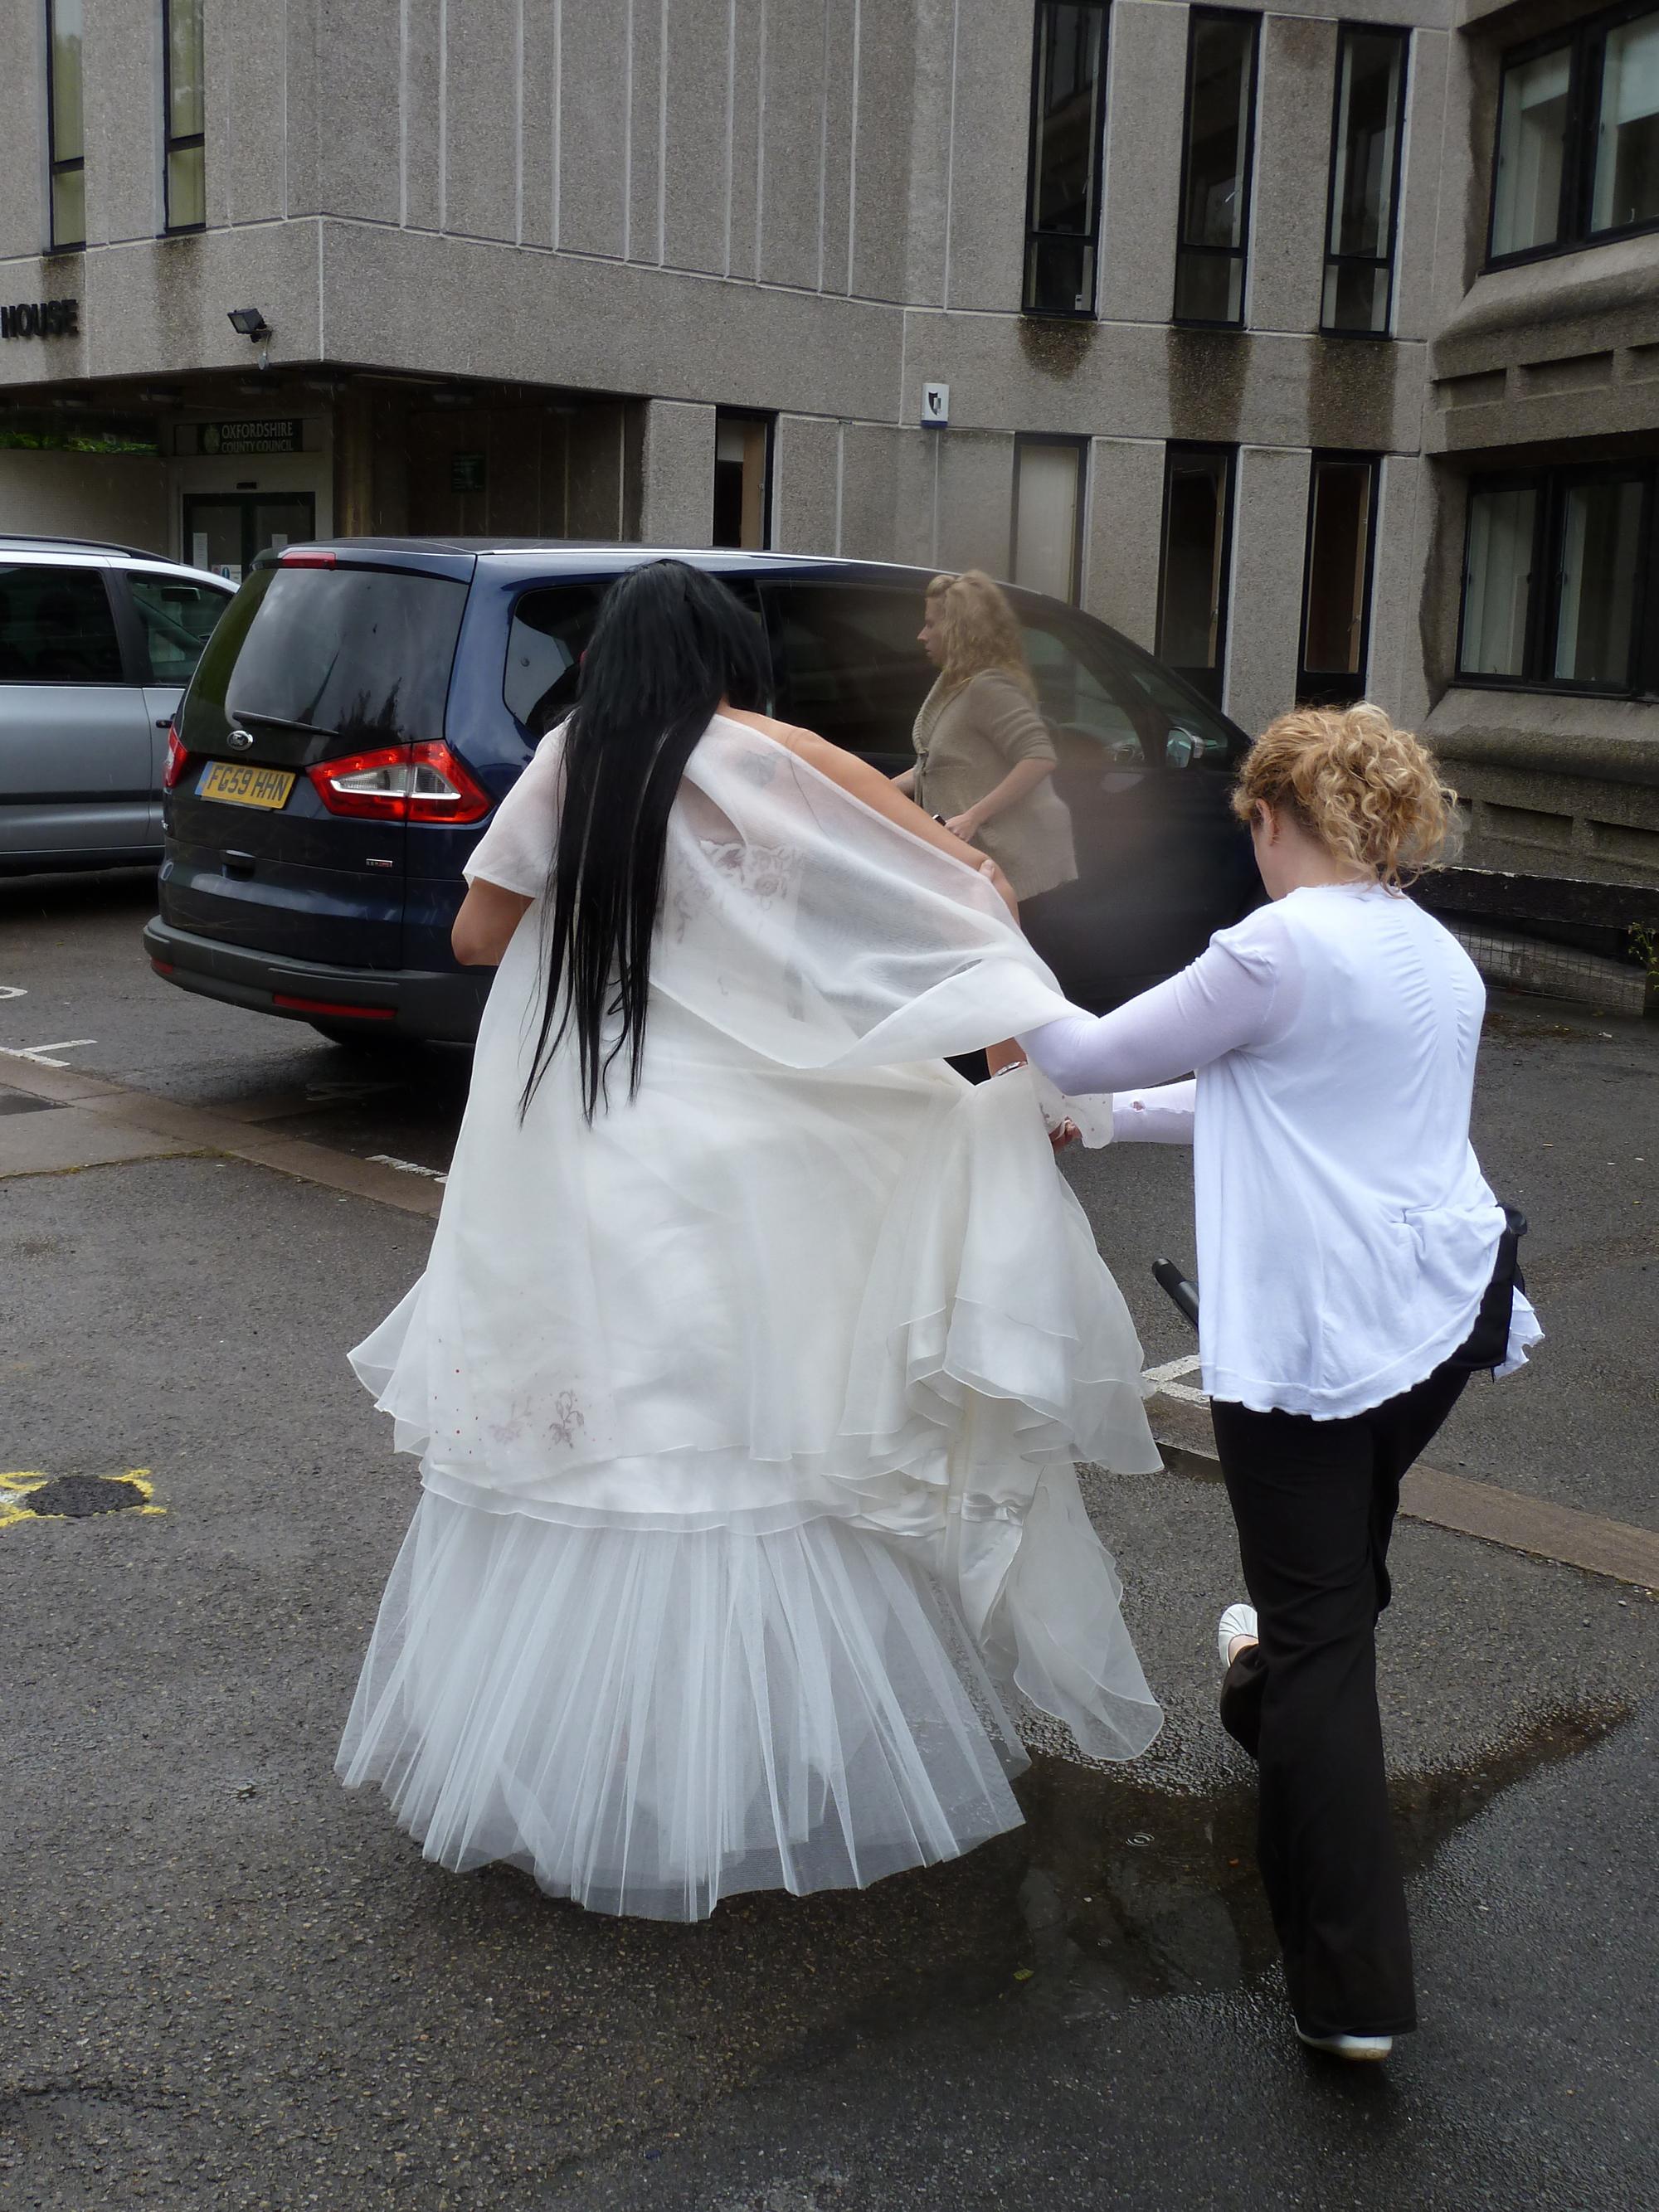 Sham marriage - Wikipedia